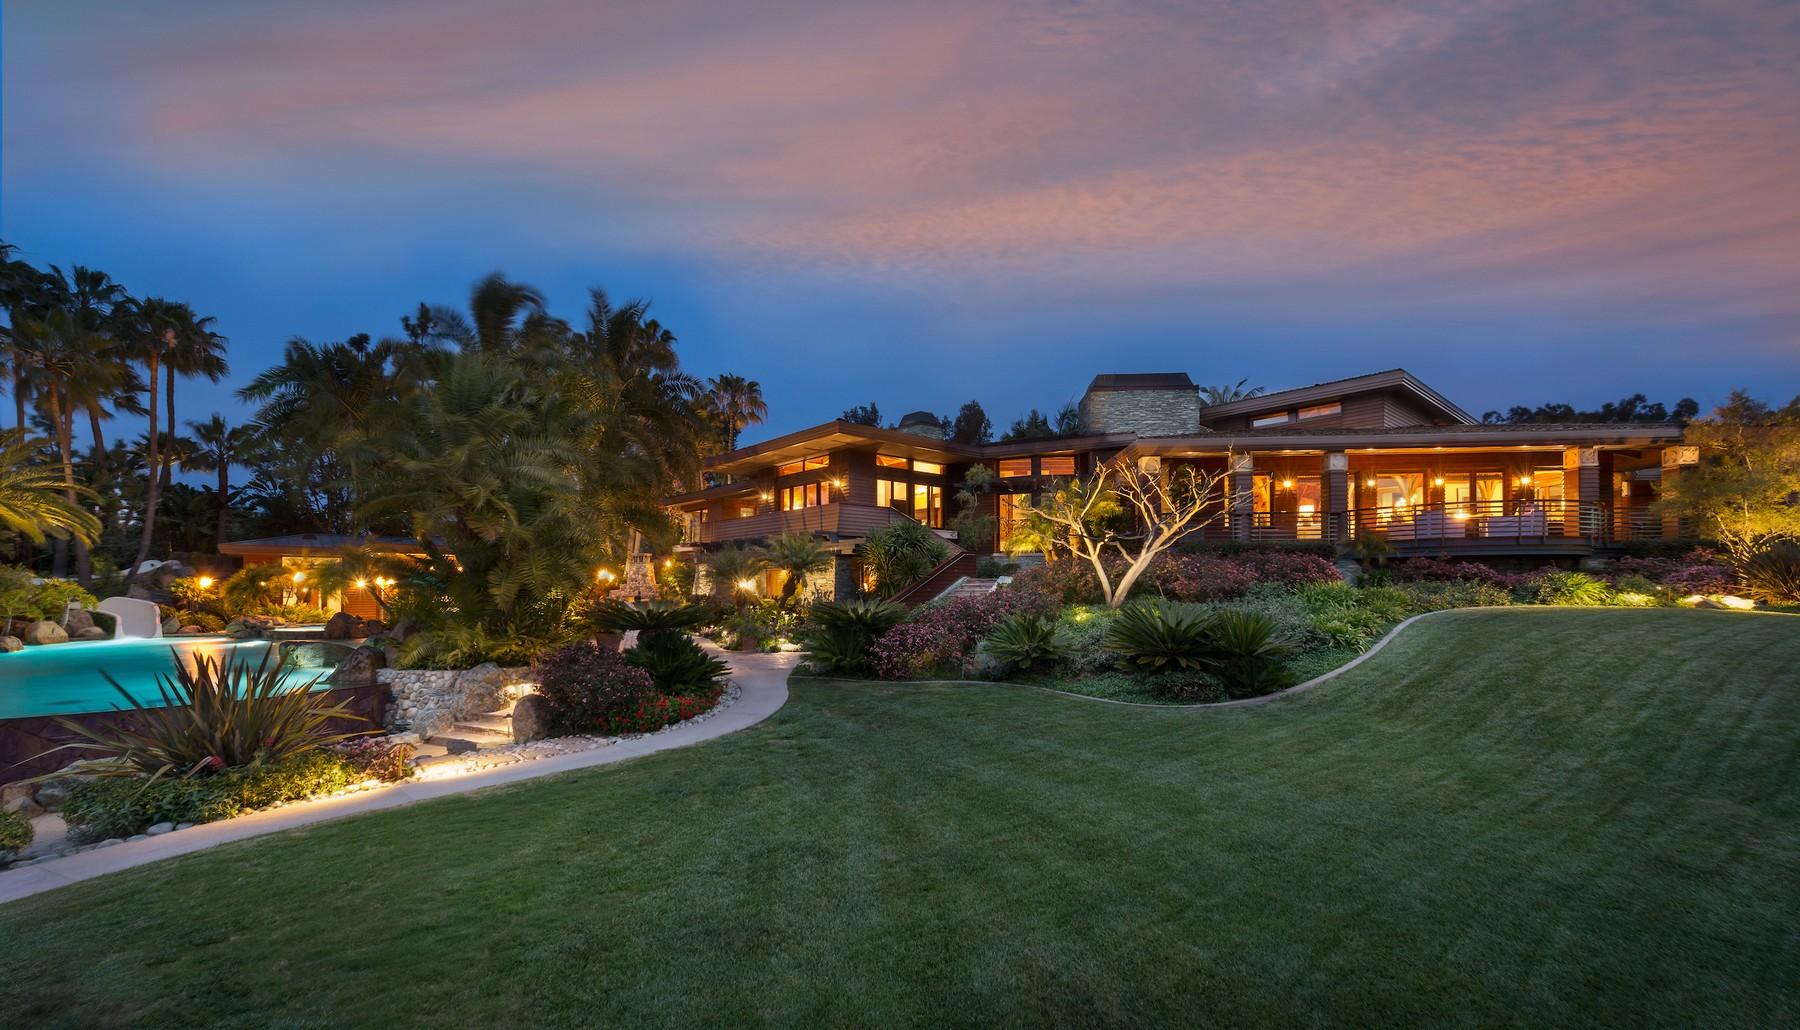 Single Family Home for Active at 4840 El Secreto 4840 El Secreto Rancho Santa Fe, California 92067 United States